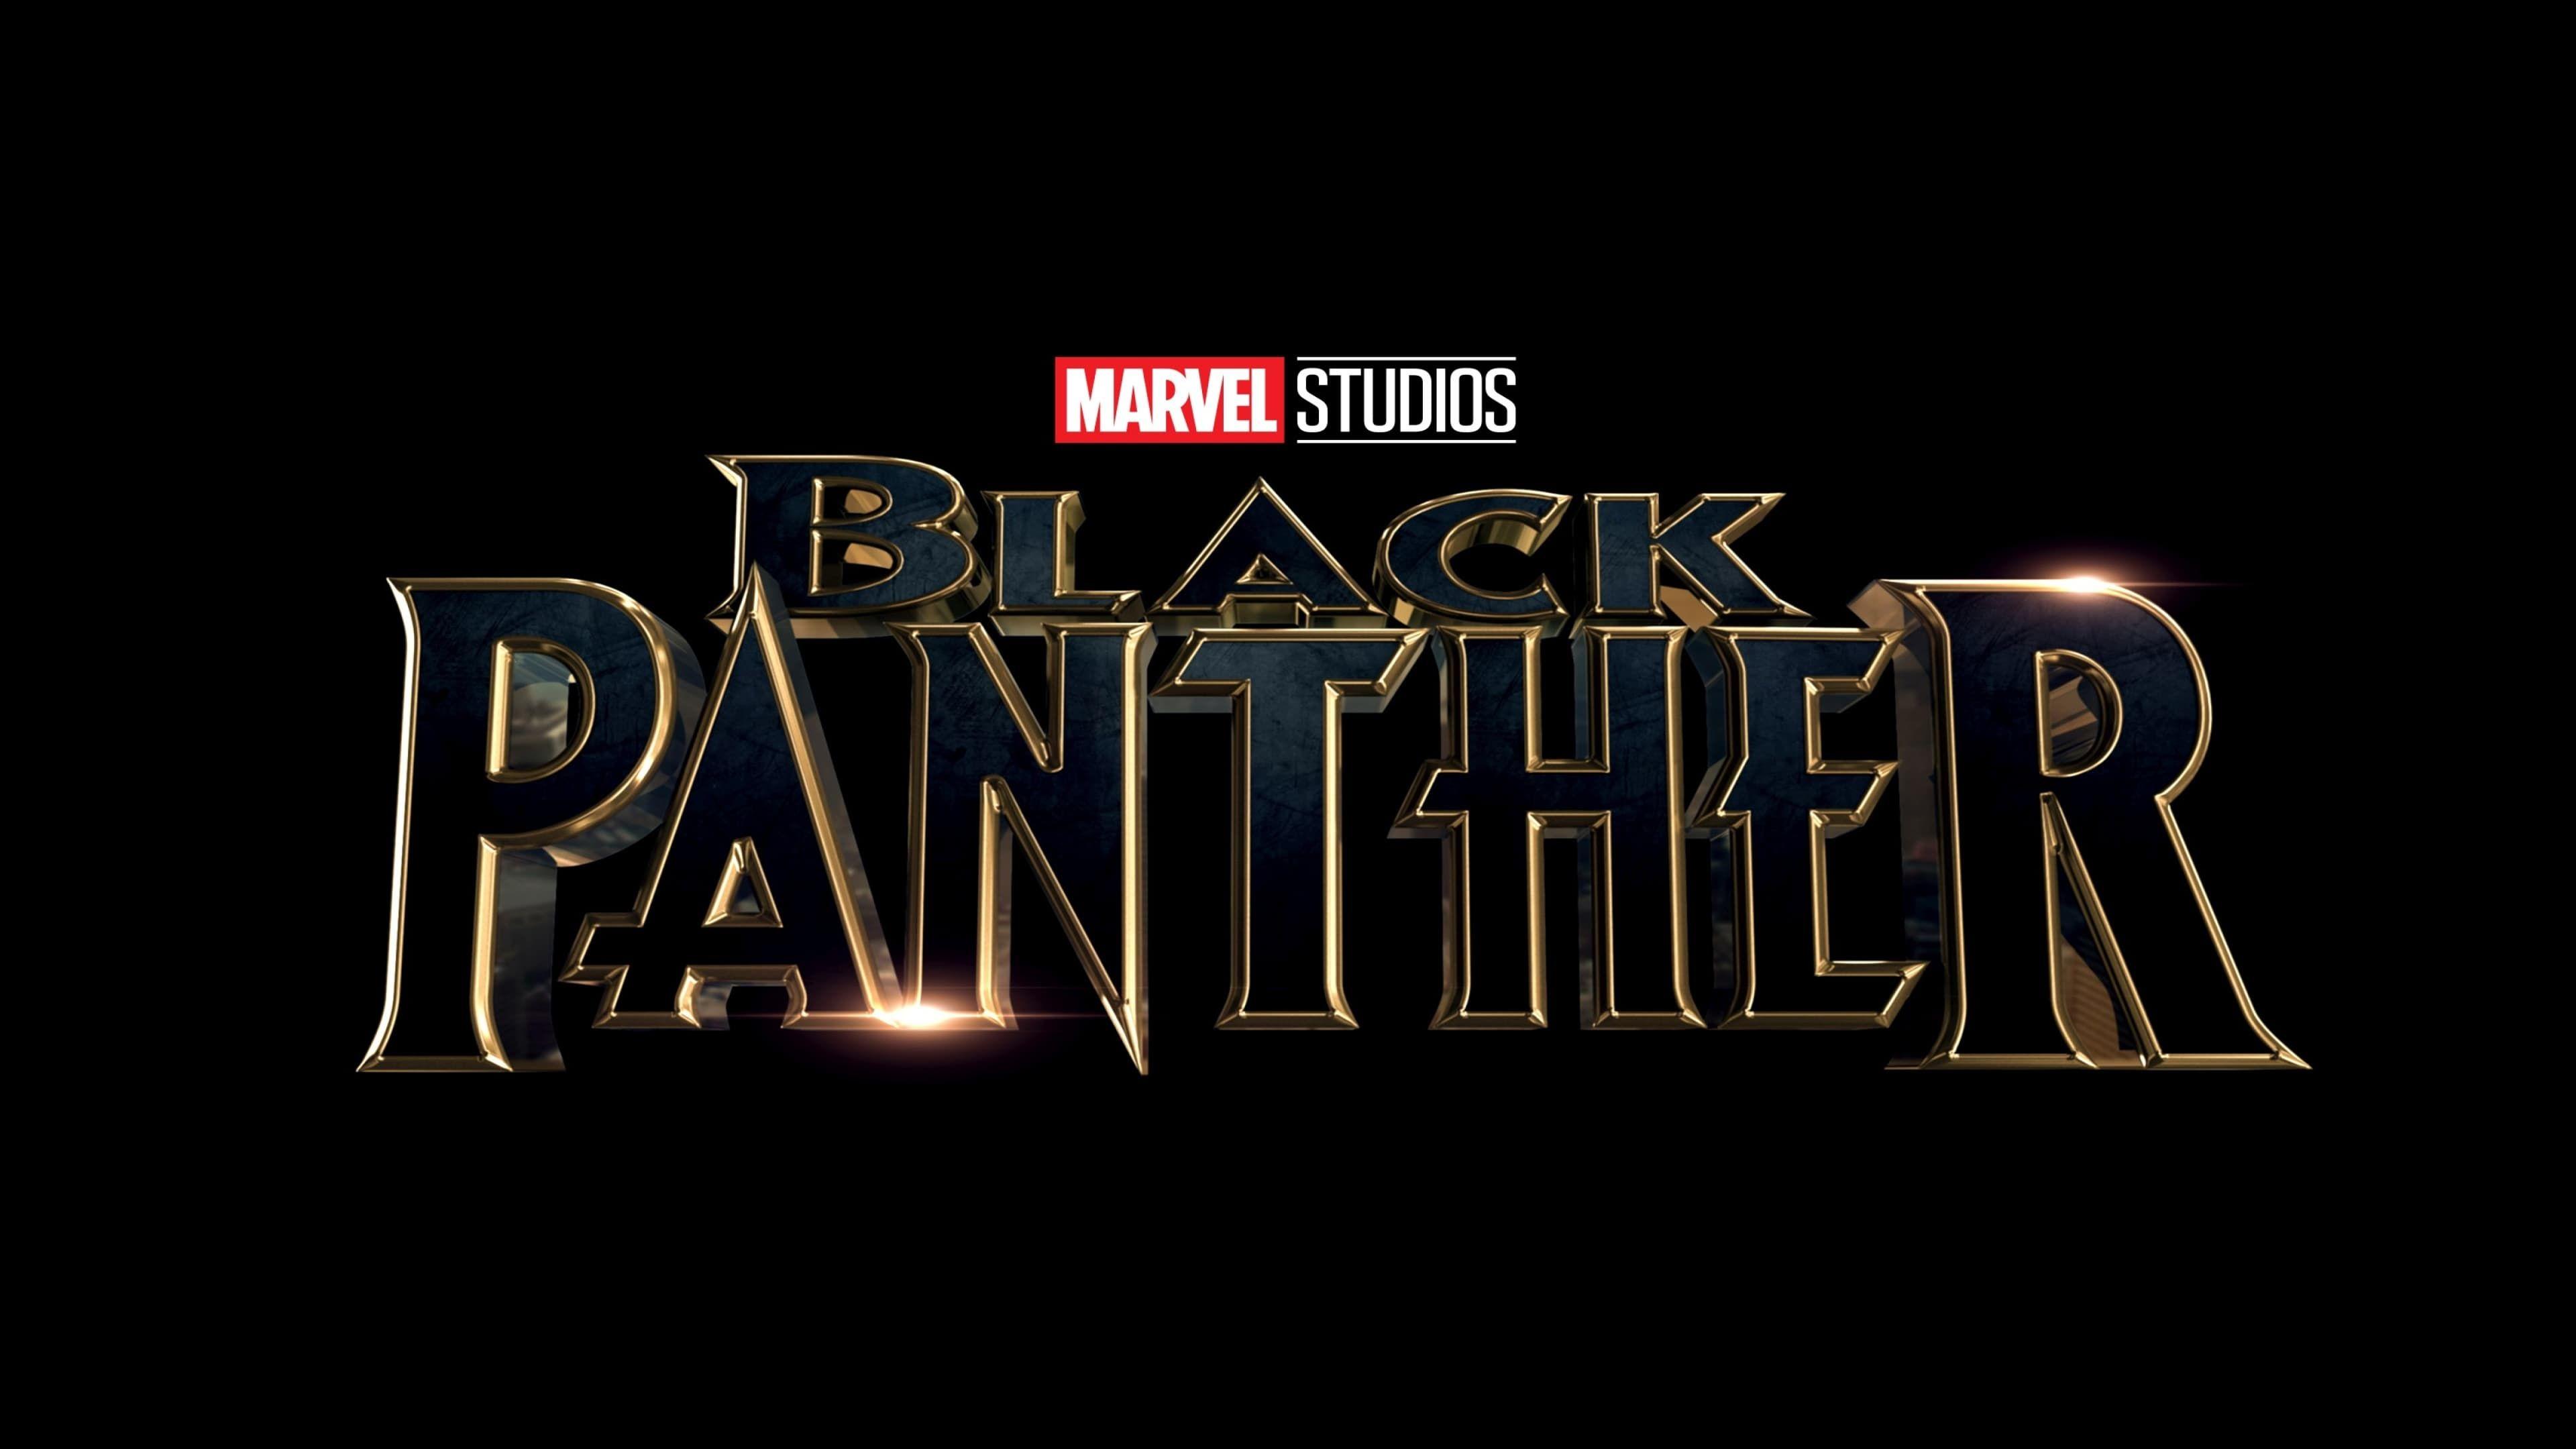 Assistir Hd Black Panther Online Completo Dublado Full